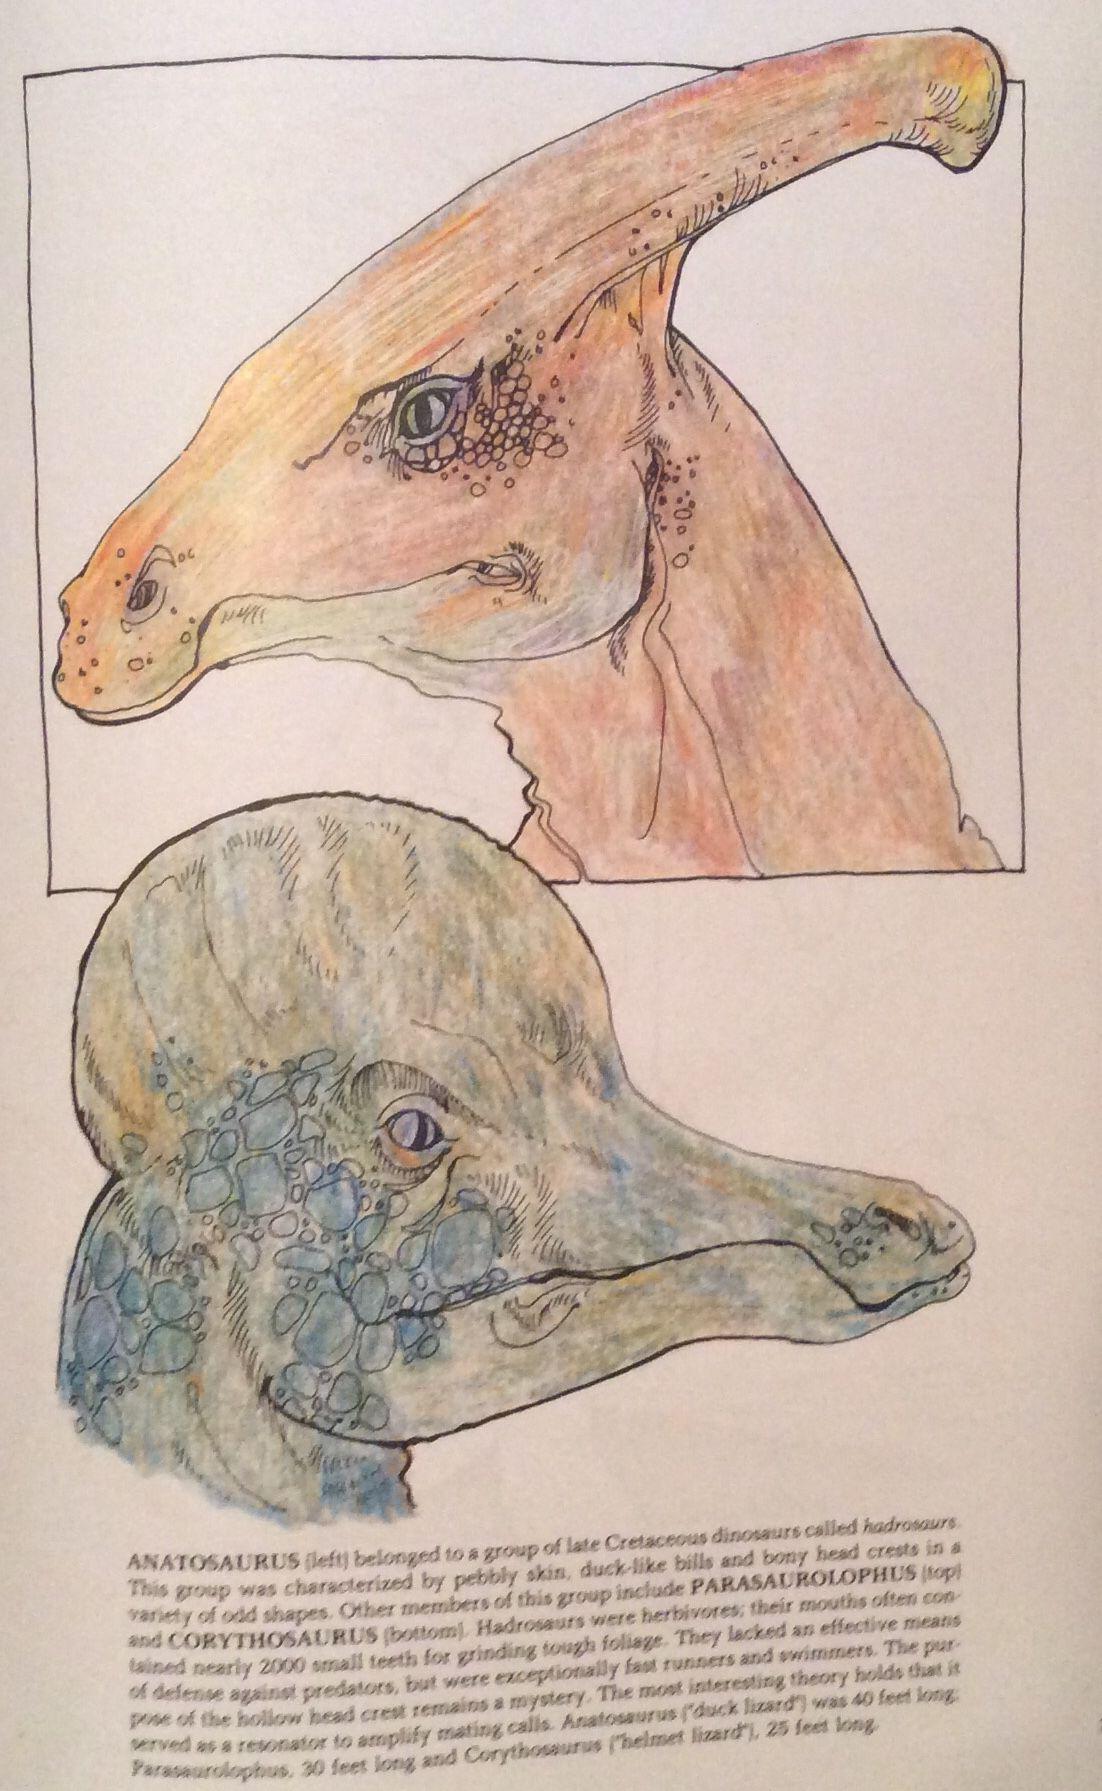 Parasaurolophus (top) and Corythosaurus (bottom